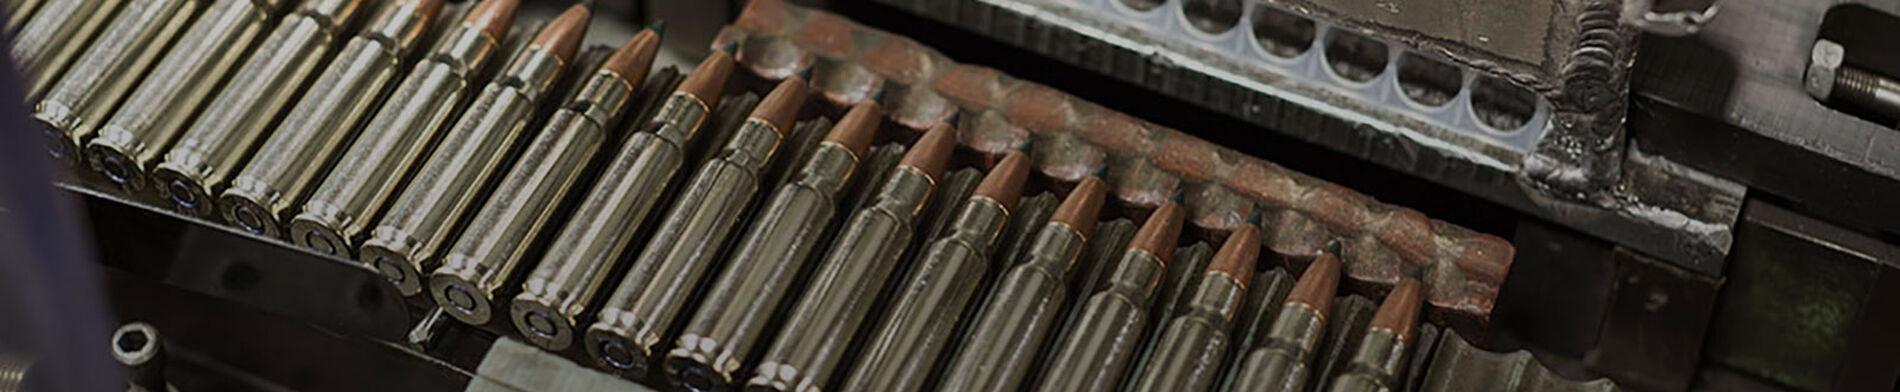 Ammunition on Conveyor